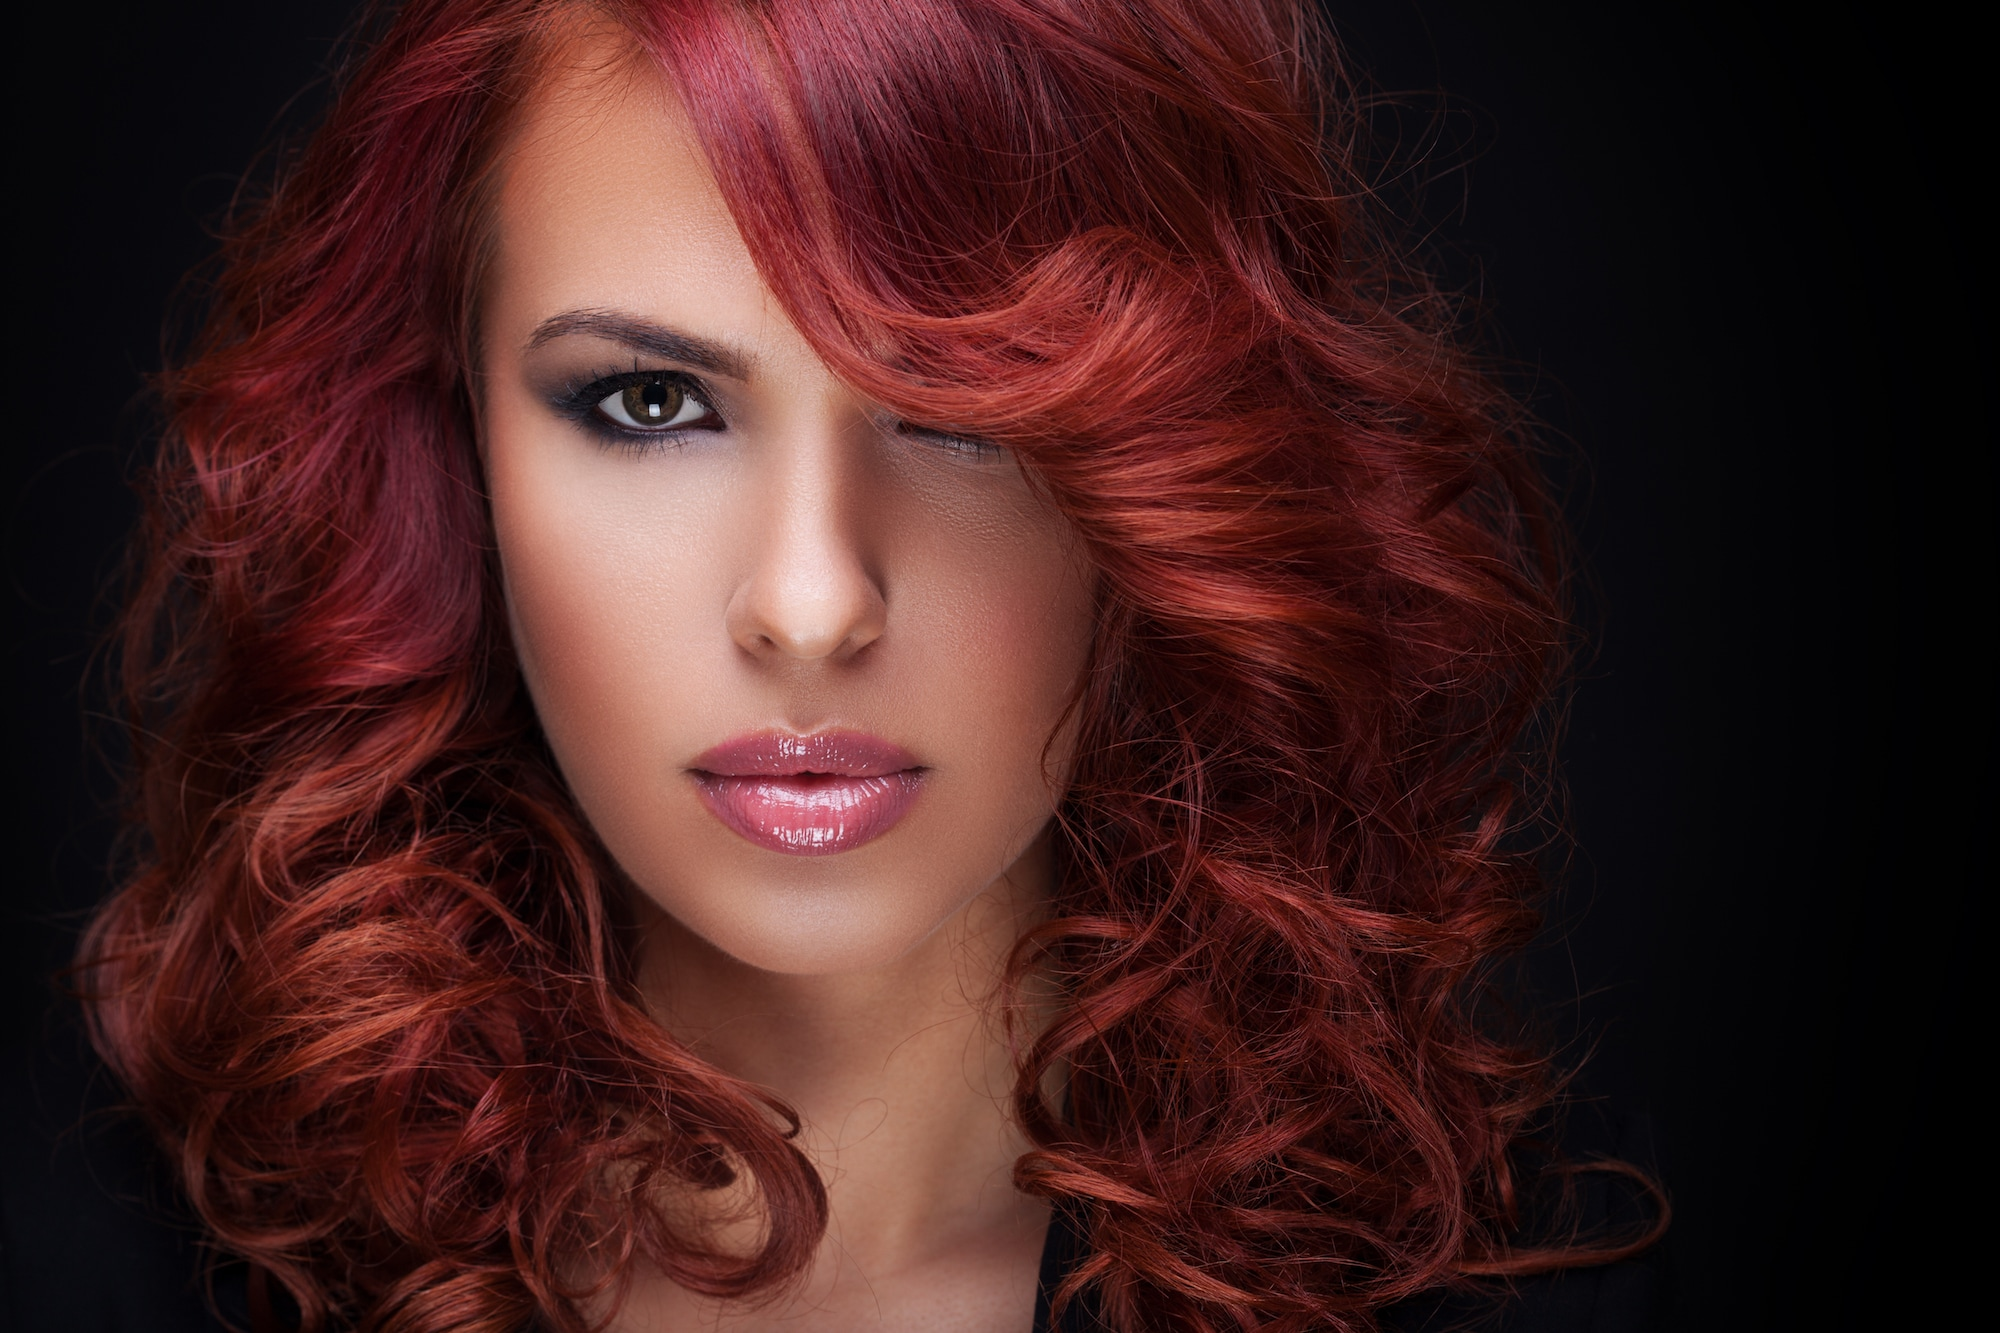 Warna rambut burgundy pada kulit sawo matang.